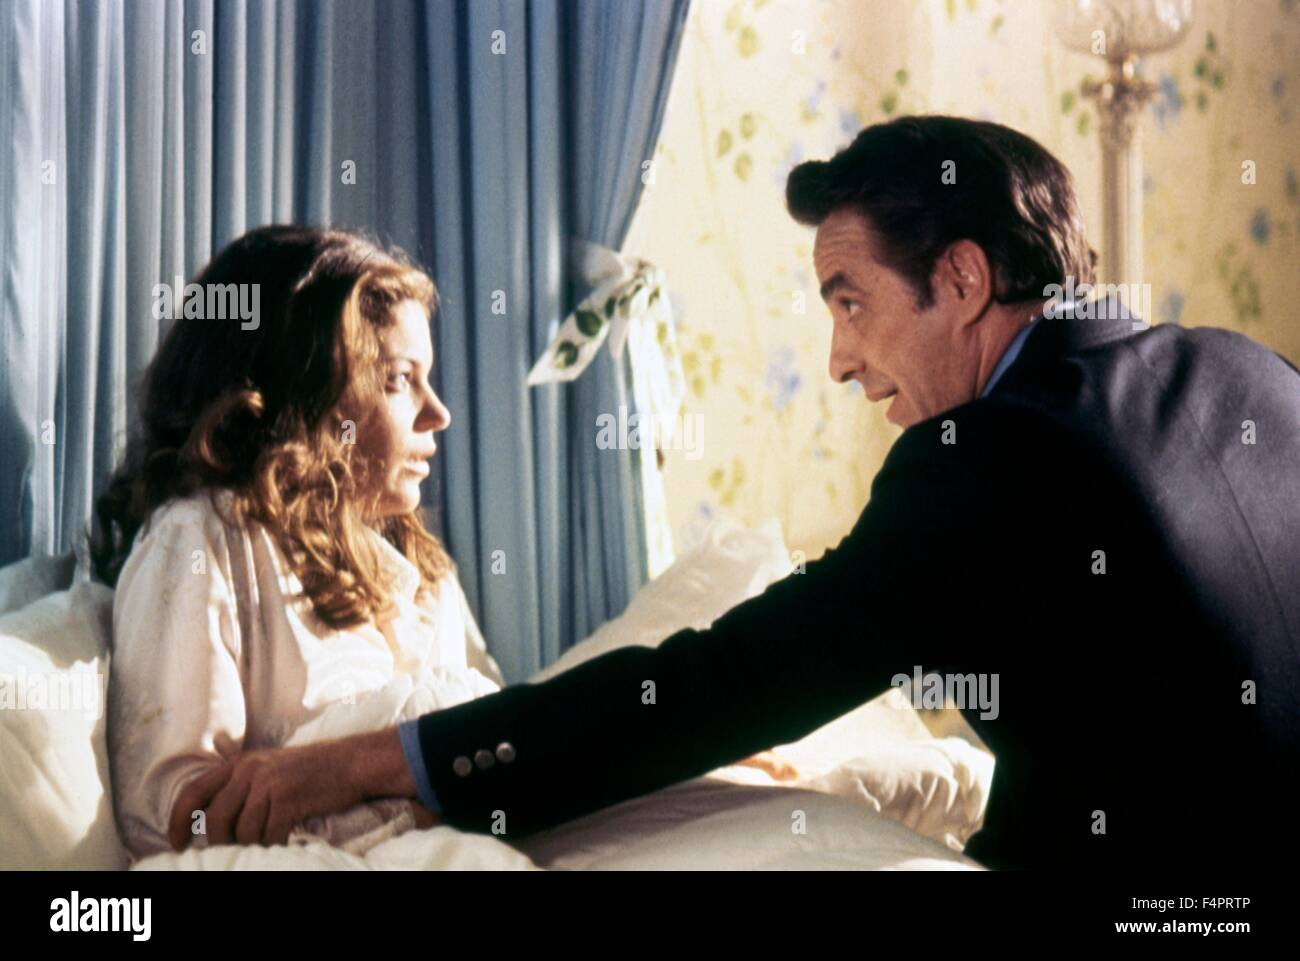 Amy Irving and John Cassavetes / The Fury / 1978 directed by Brian De Palma [Twentieth Century Fox Film Corpo] - Stock Image